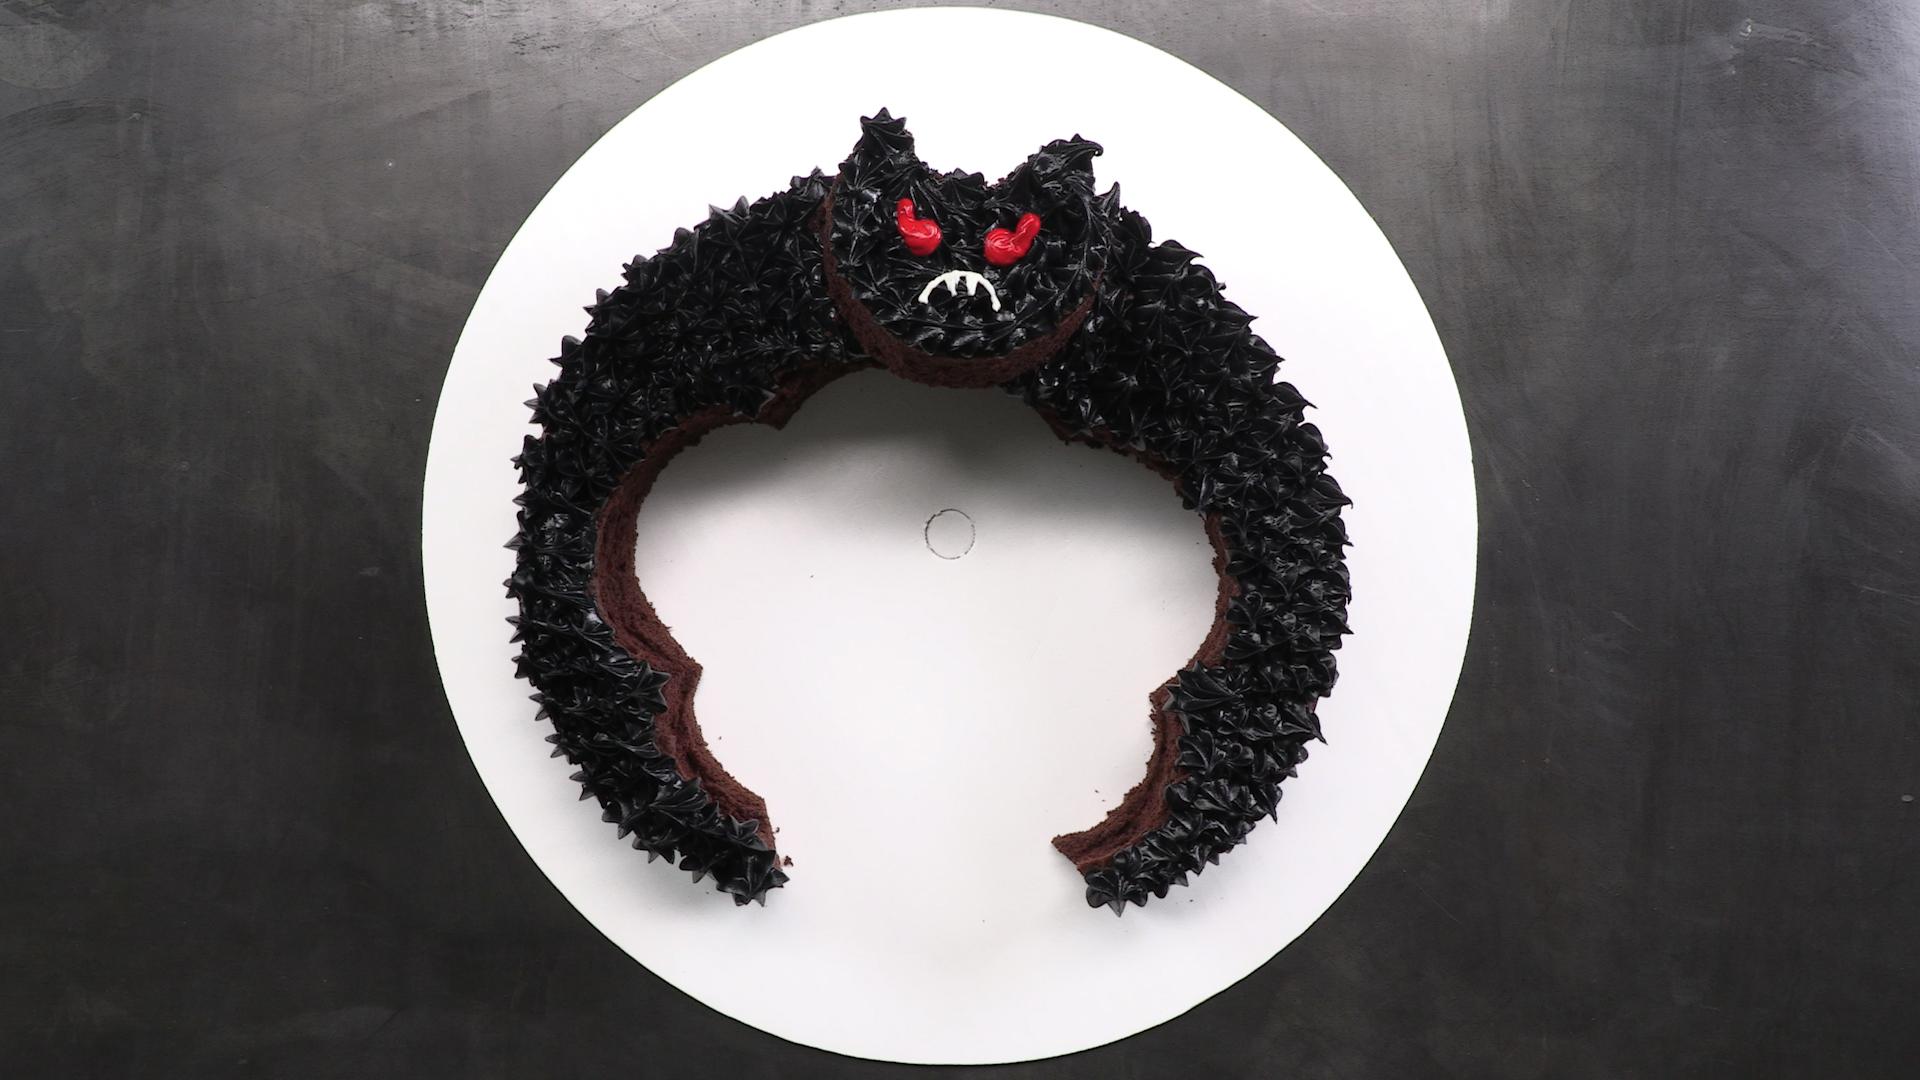 Bat Cake image